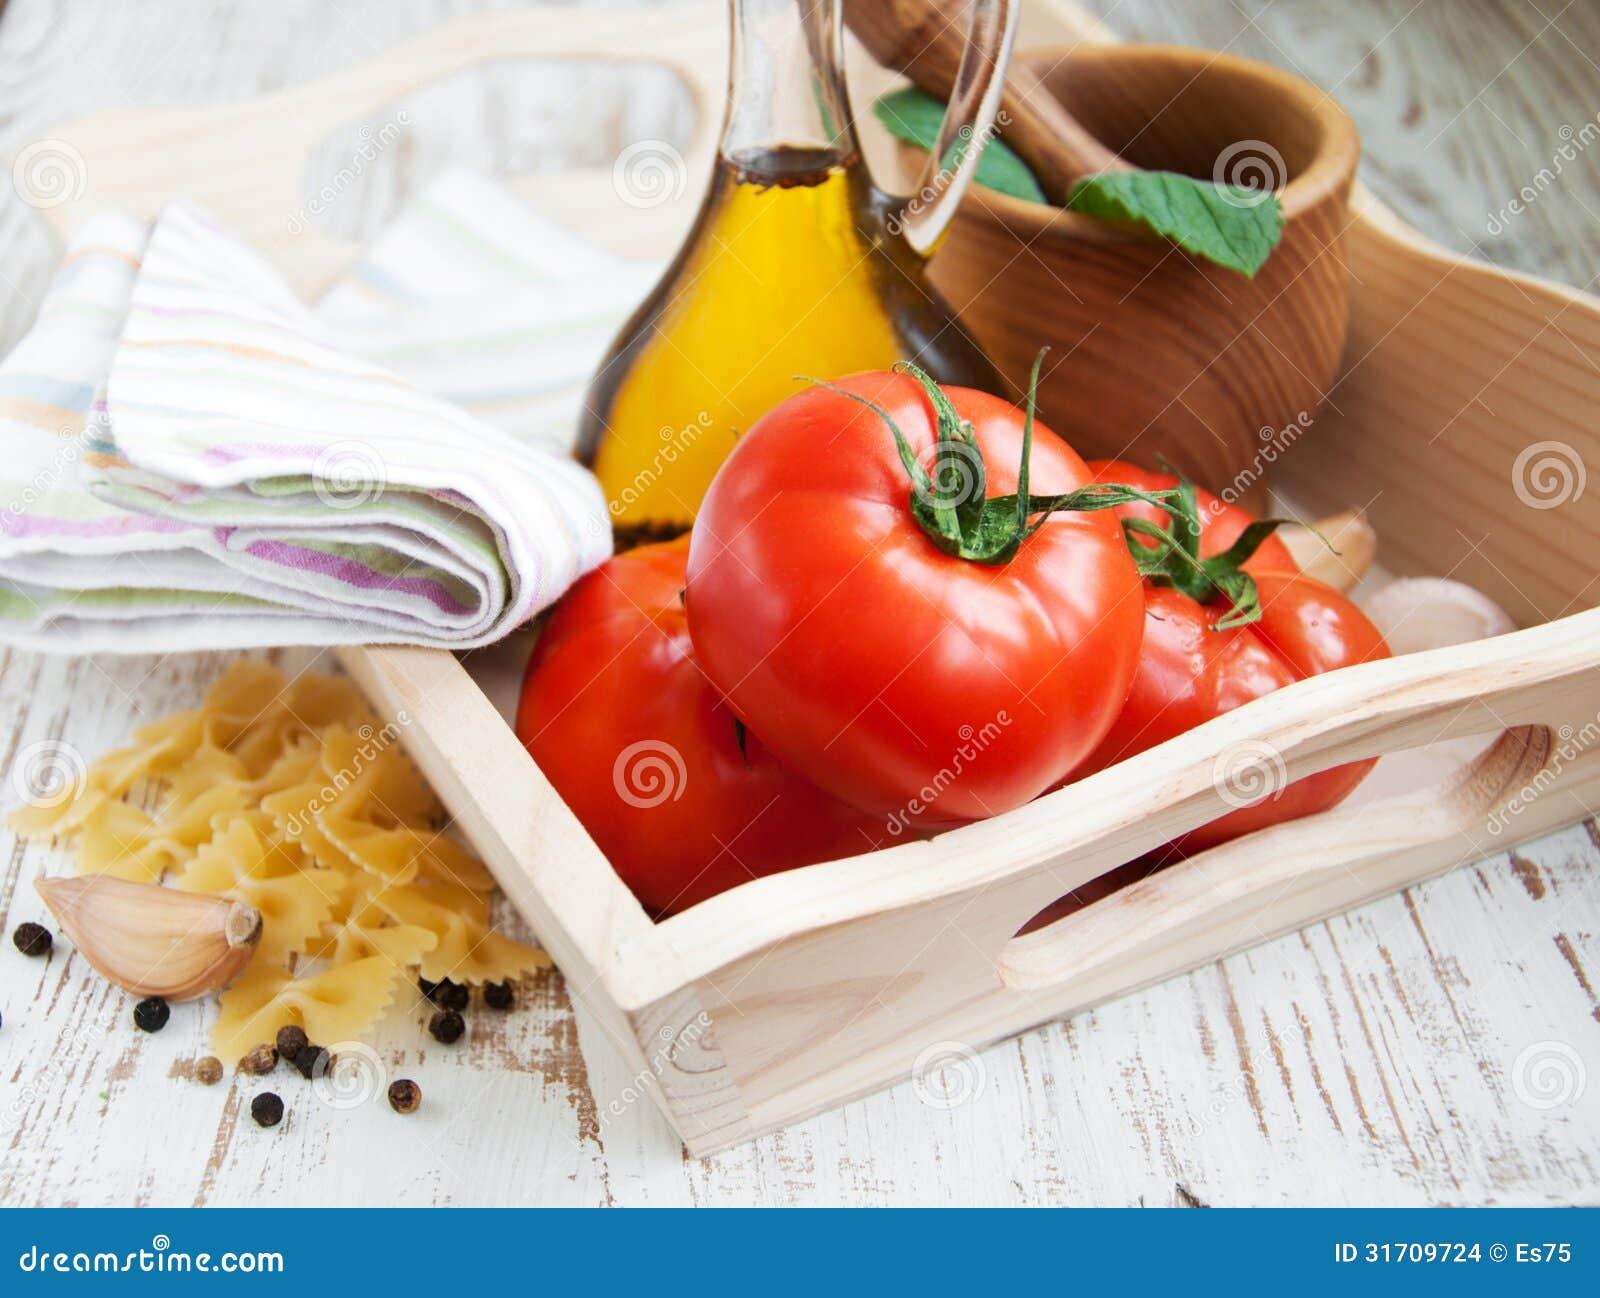 Ingredientes para una comida italiana imagenes de archivo for Ingredientes para comida